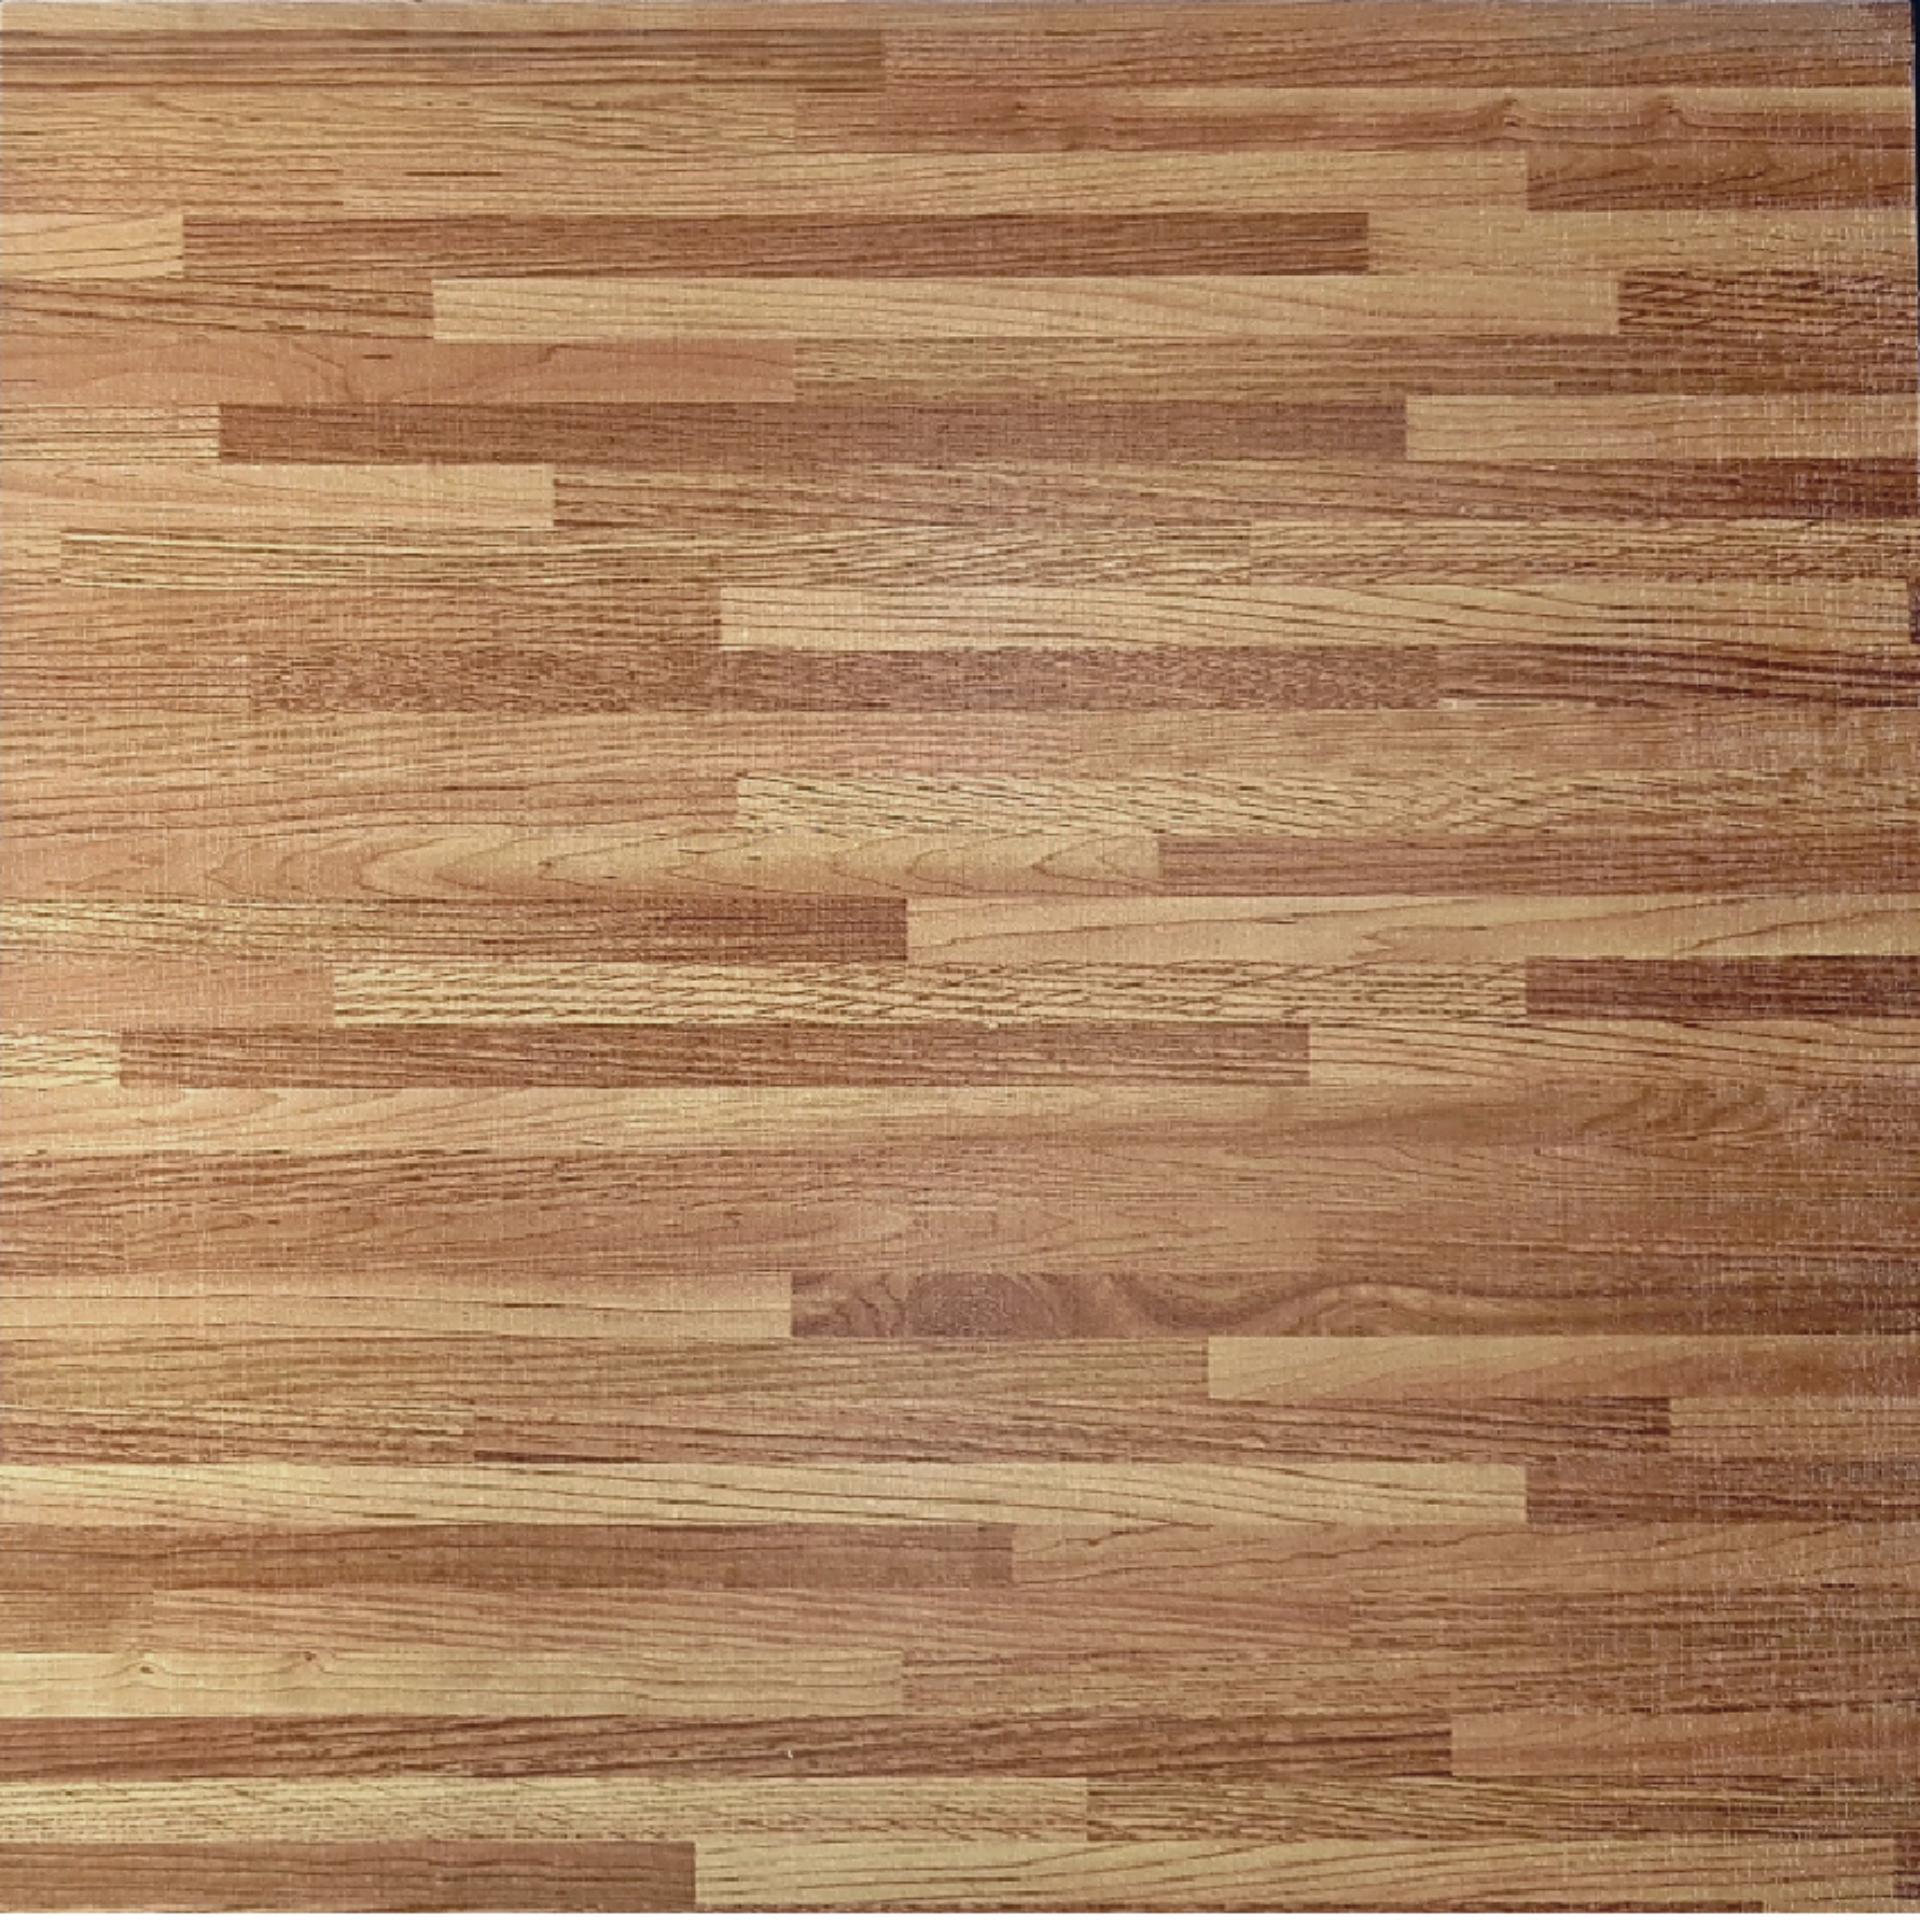 Vinyl tiles for sale vinyl flooring prices brands review in uni luxury vinyl tile flooring 60pcs box light wood textured dailygadgetfo Choice Image